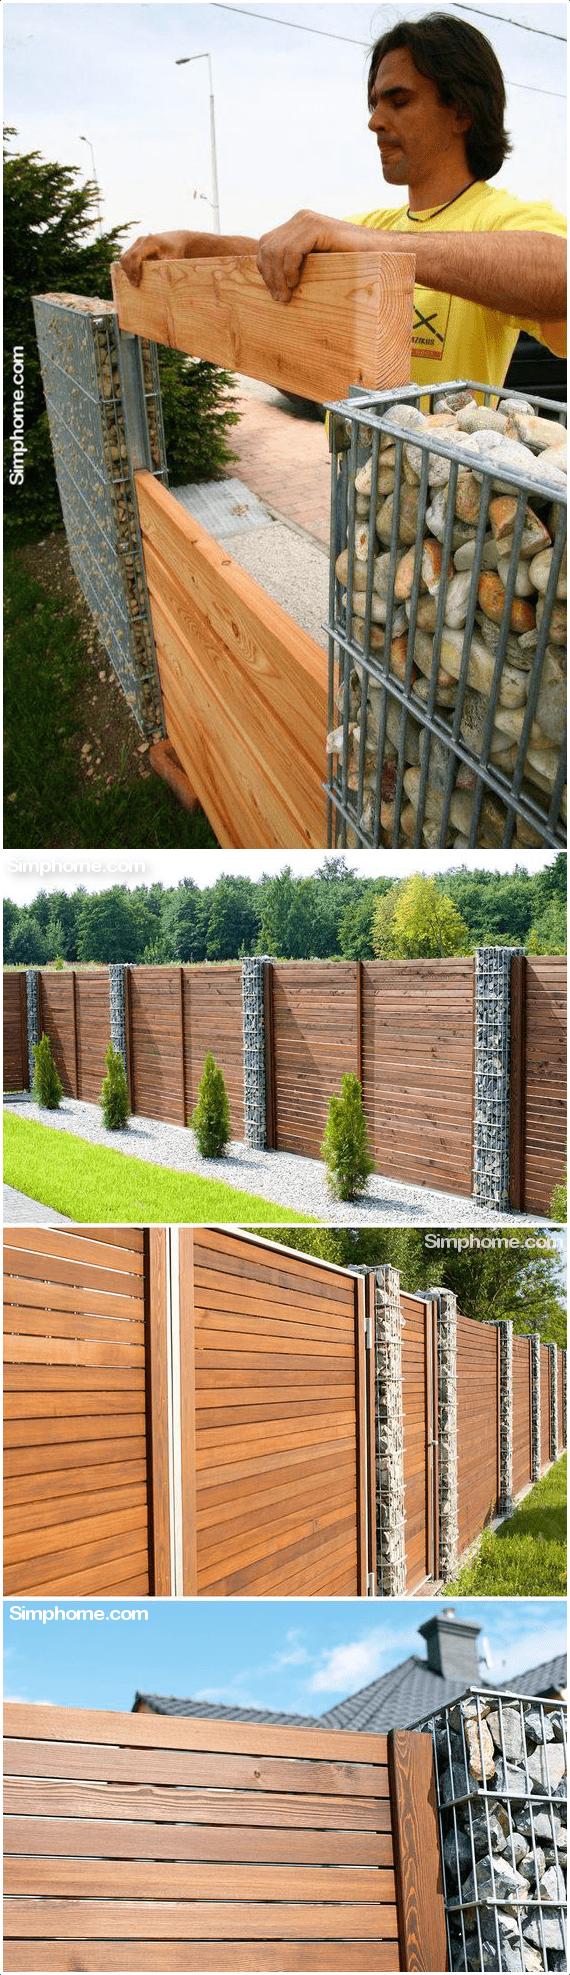 6.Wood Slats and Gabion Combo via Simphome.com